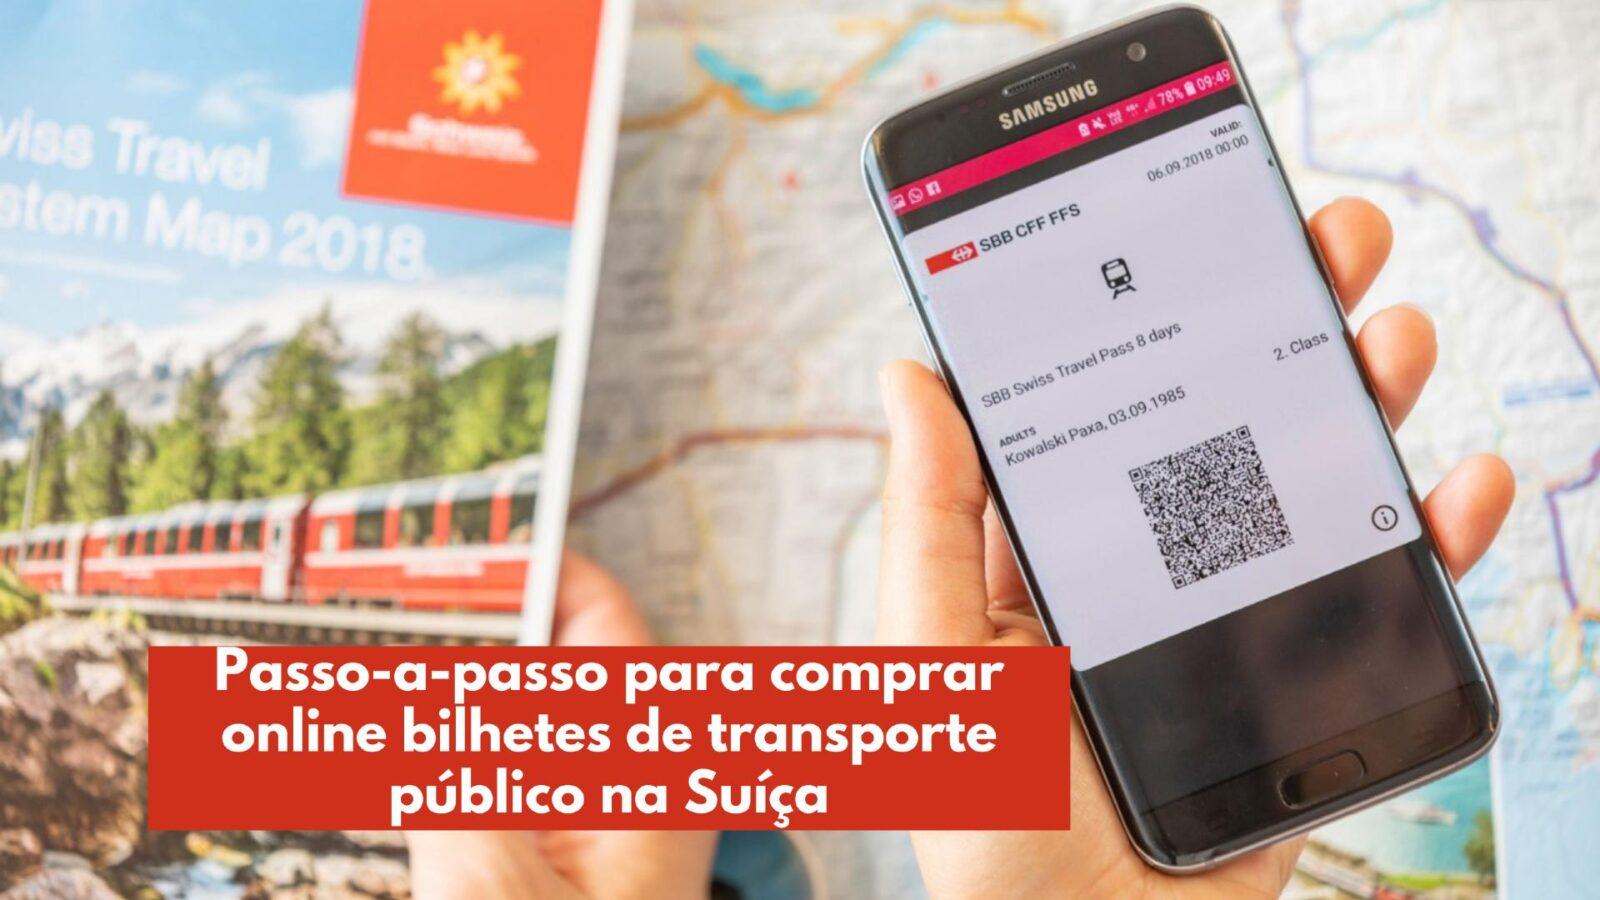 comprar online bilhetes de trem suica